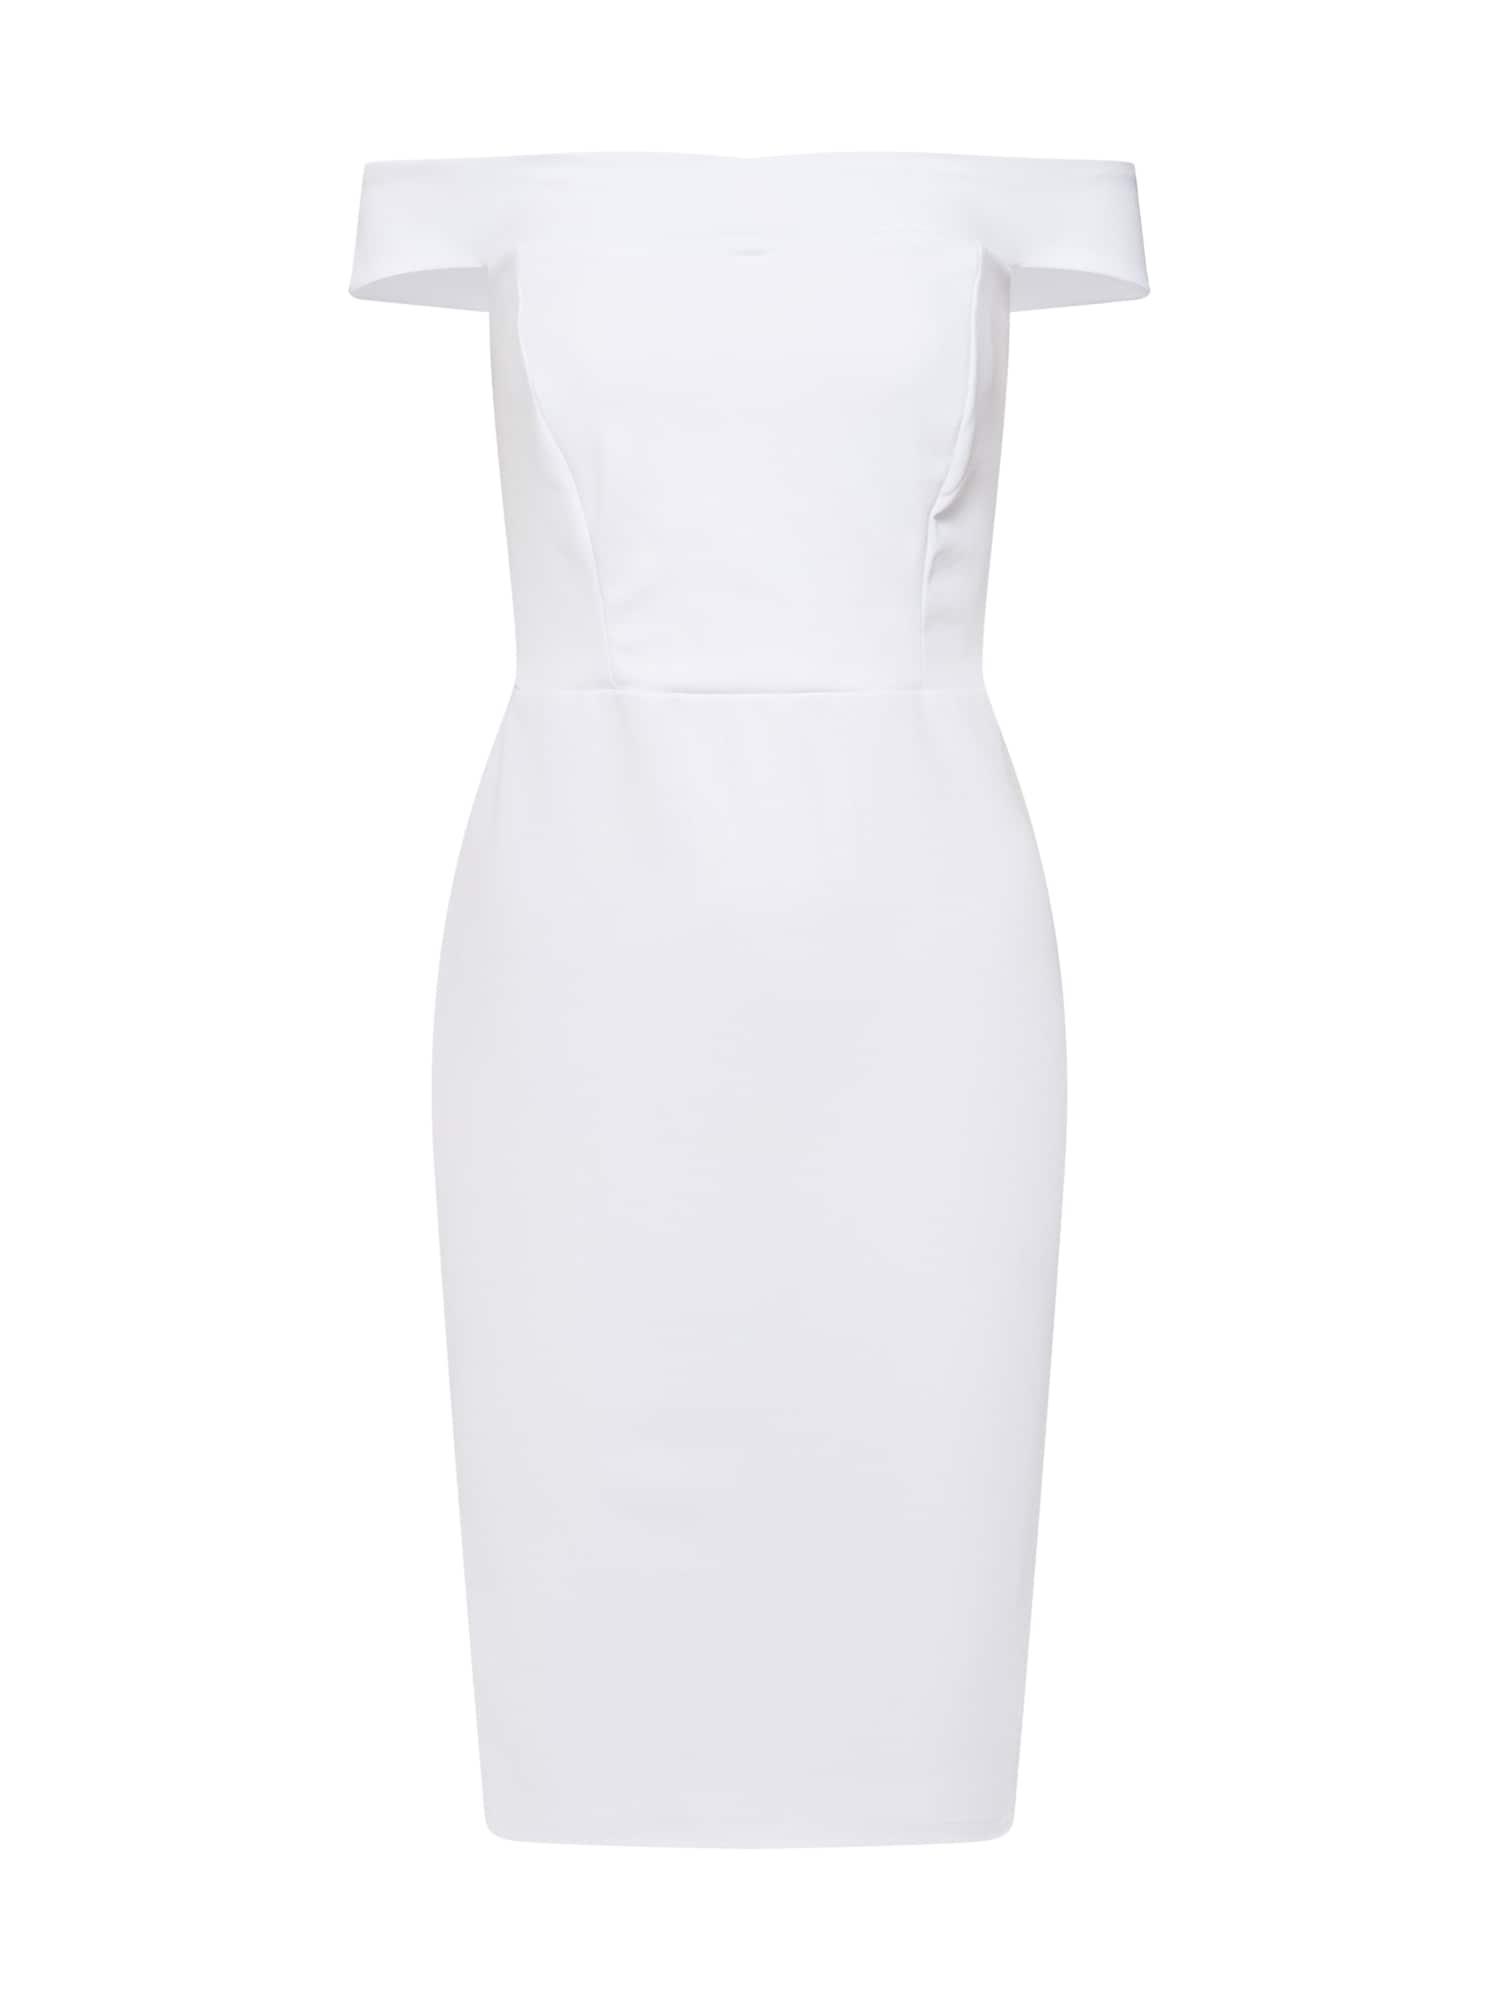 Pouzdrové šaty Scuba Bardot bílá Missguided